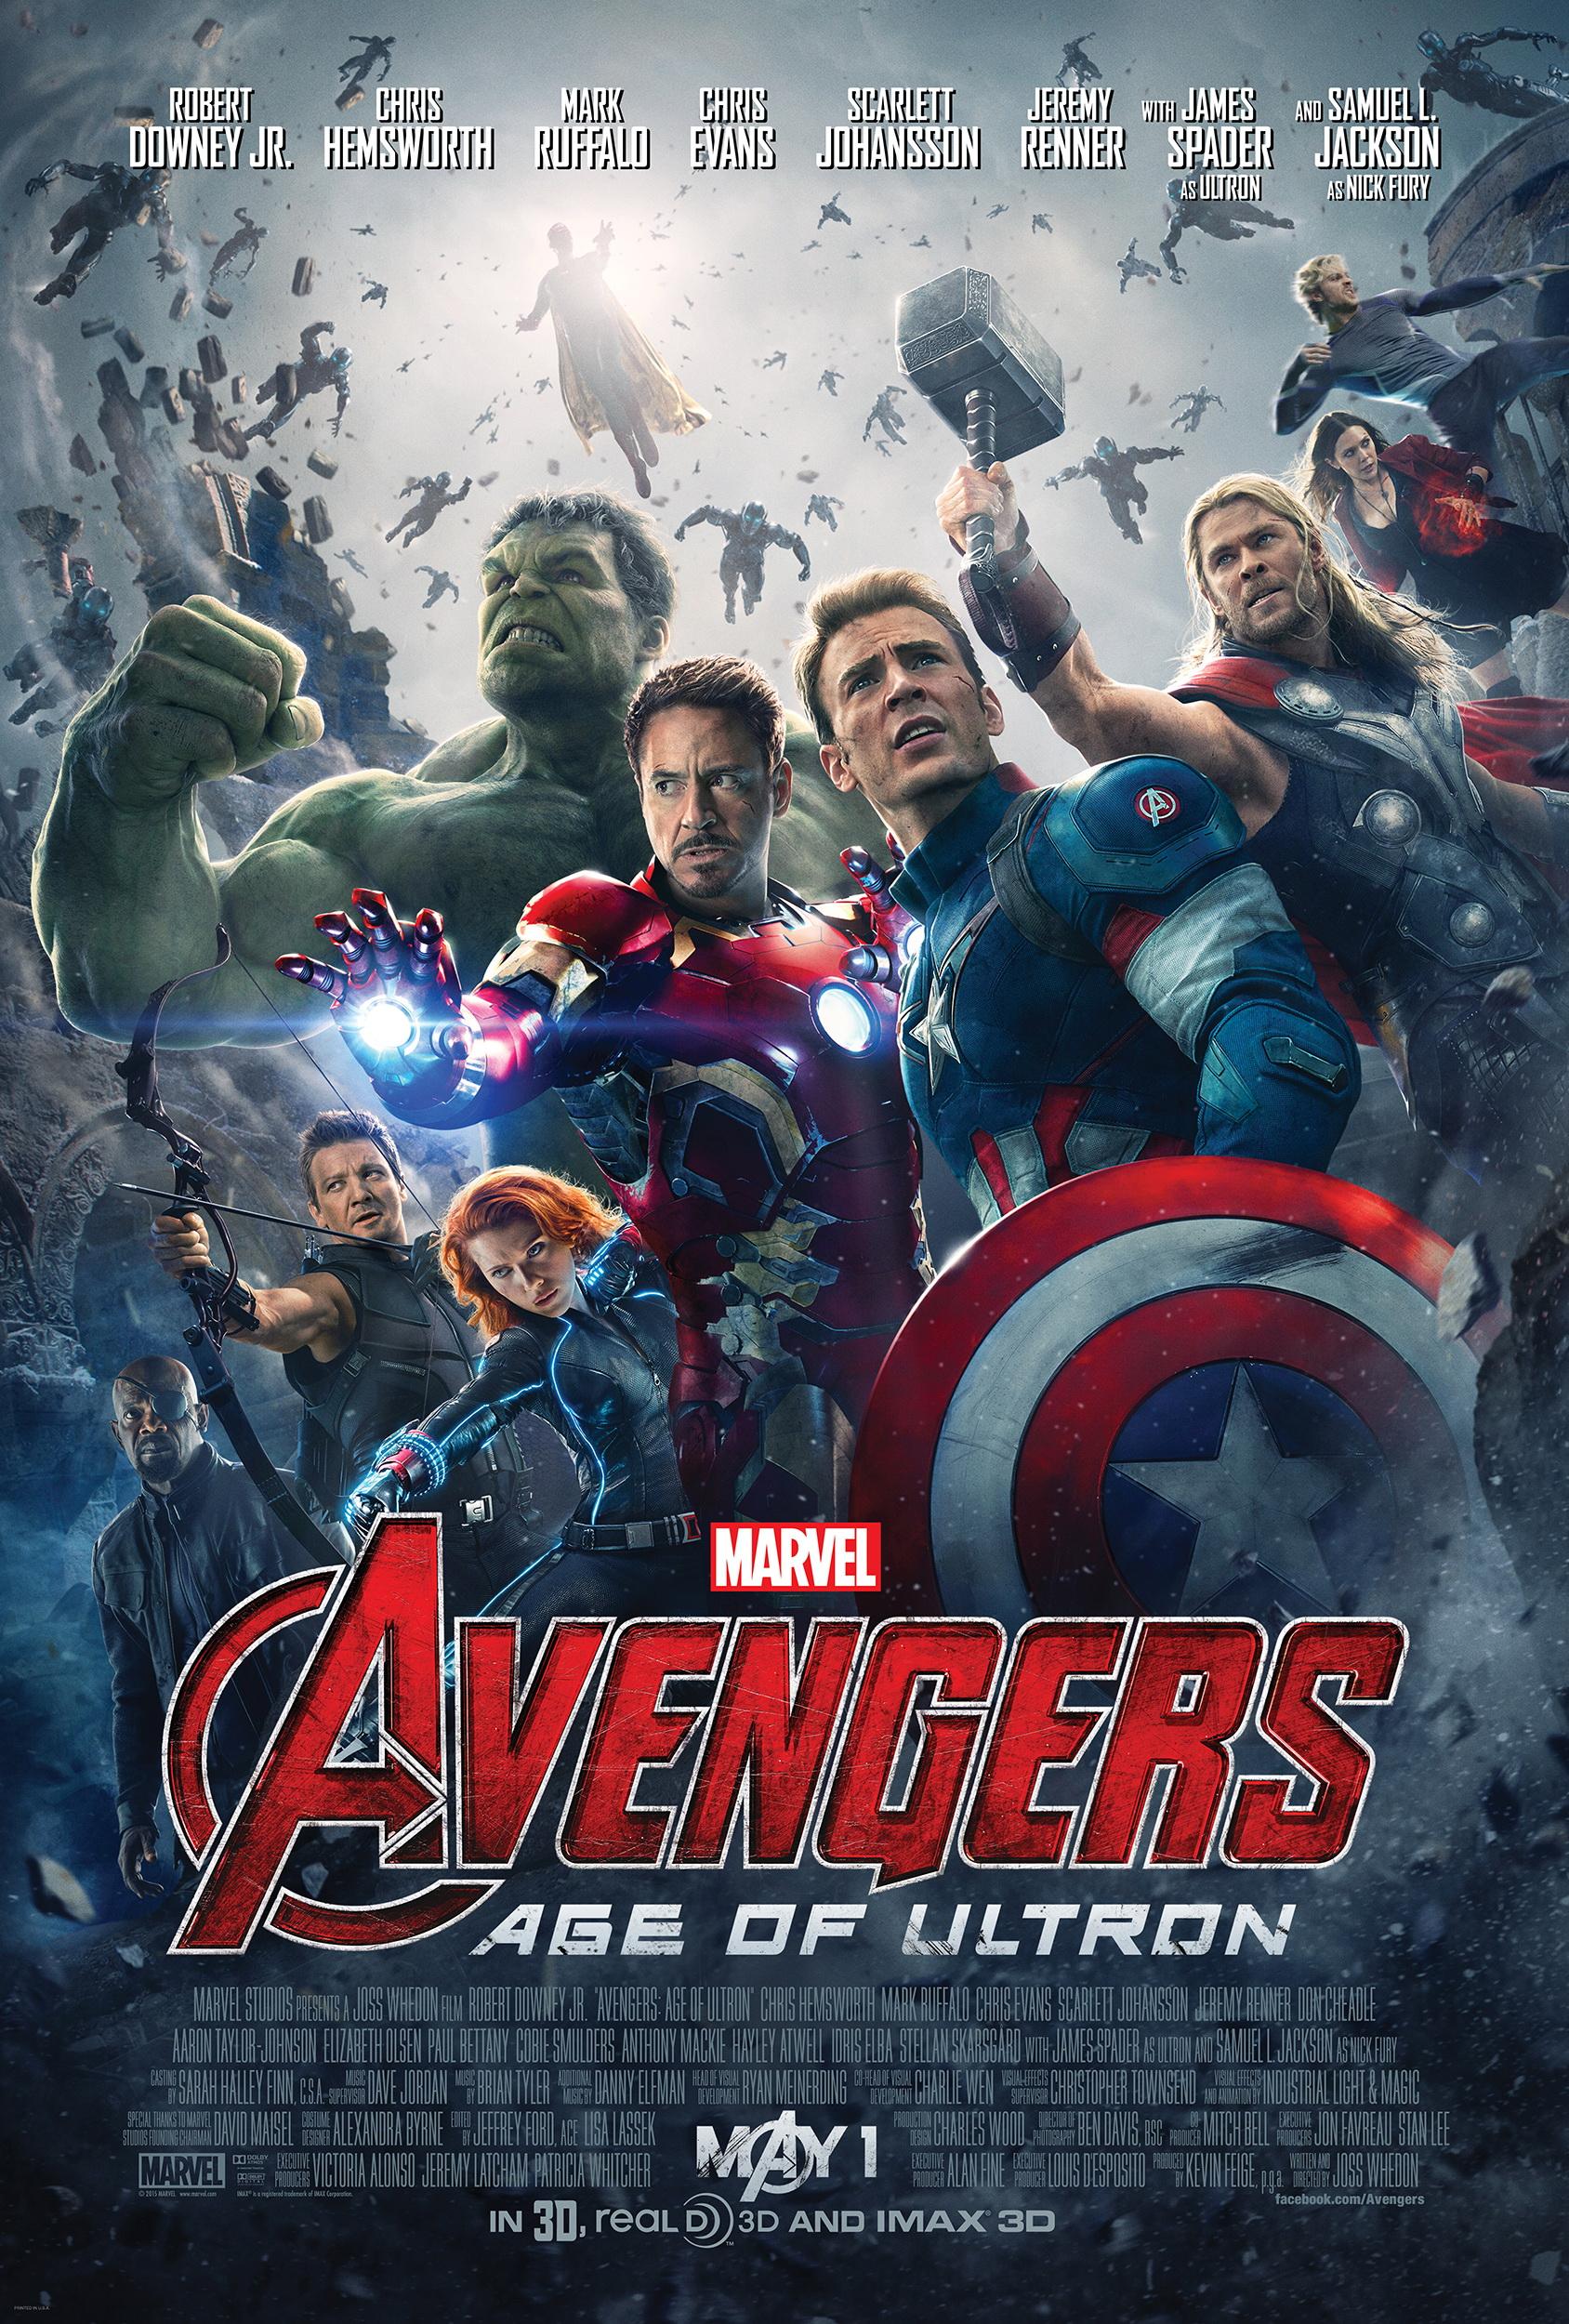 avengers_age_of_ultron_poster.jpg